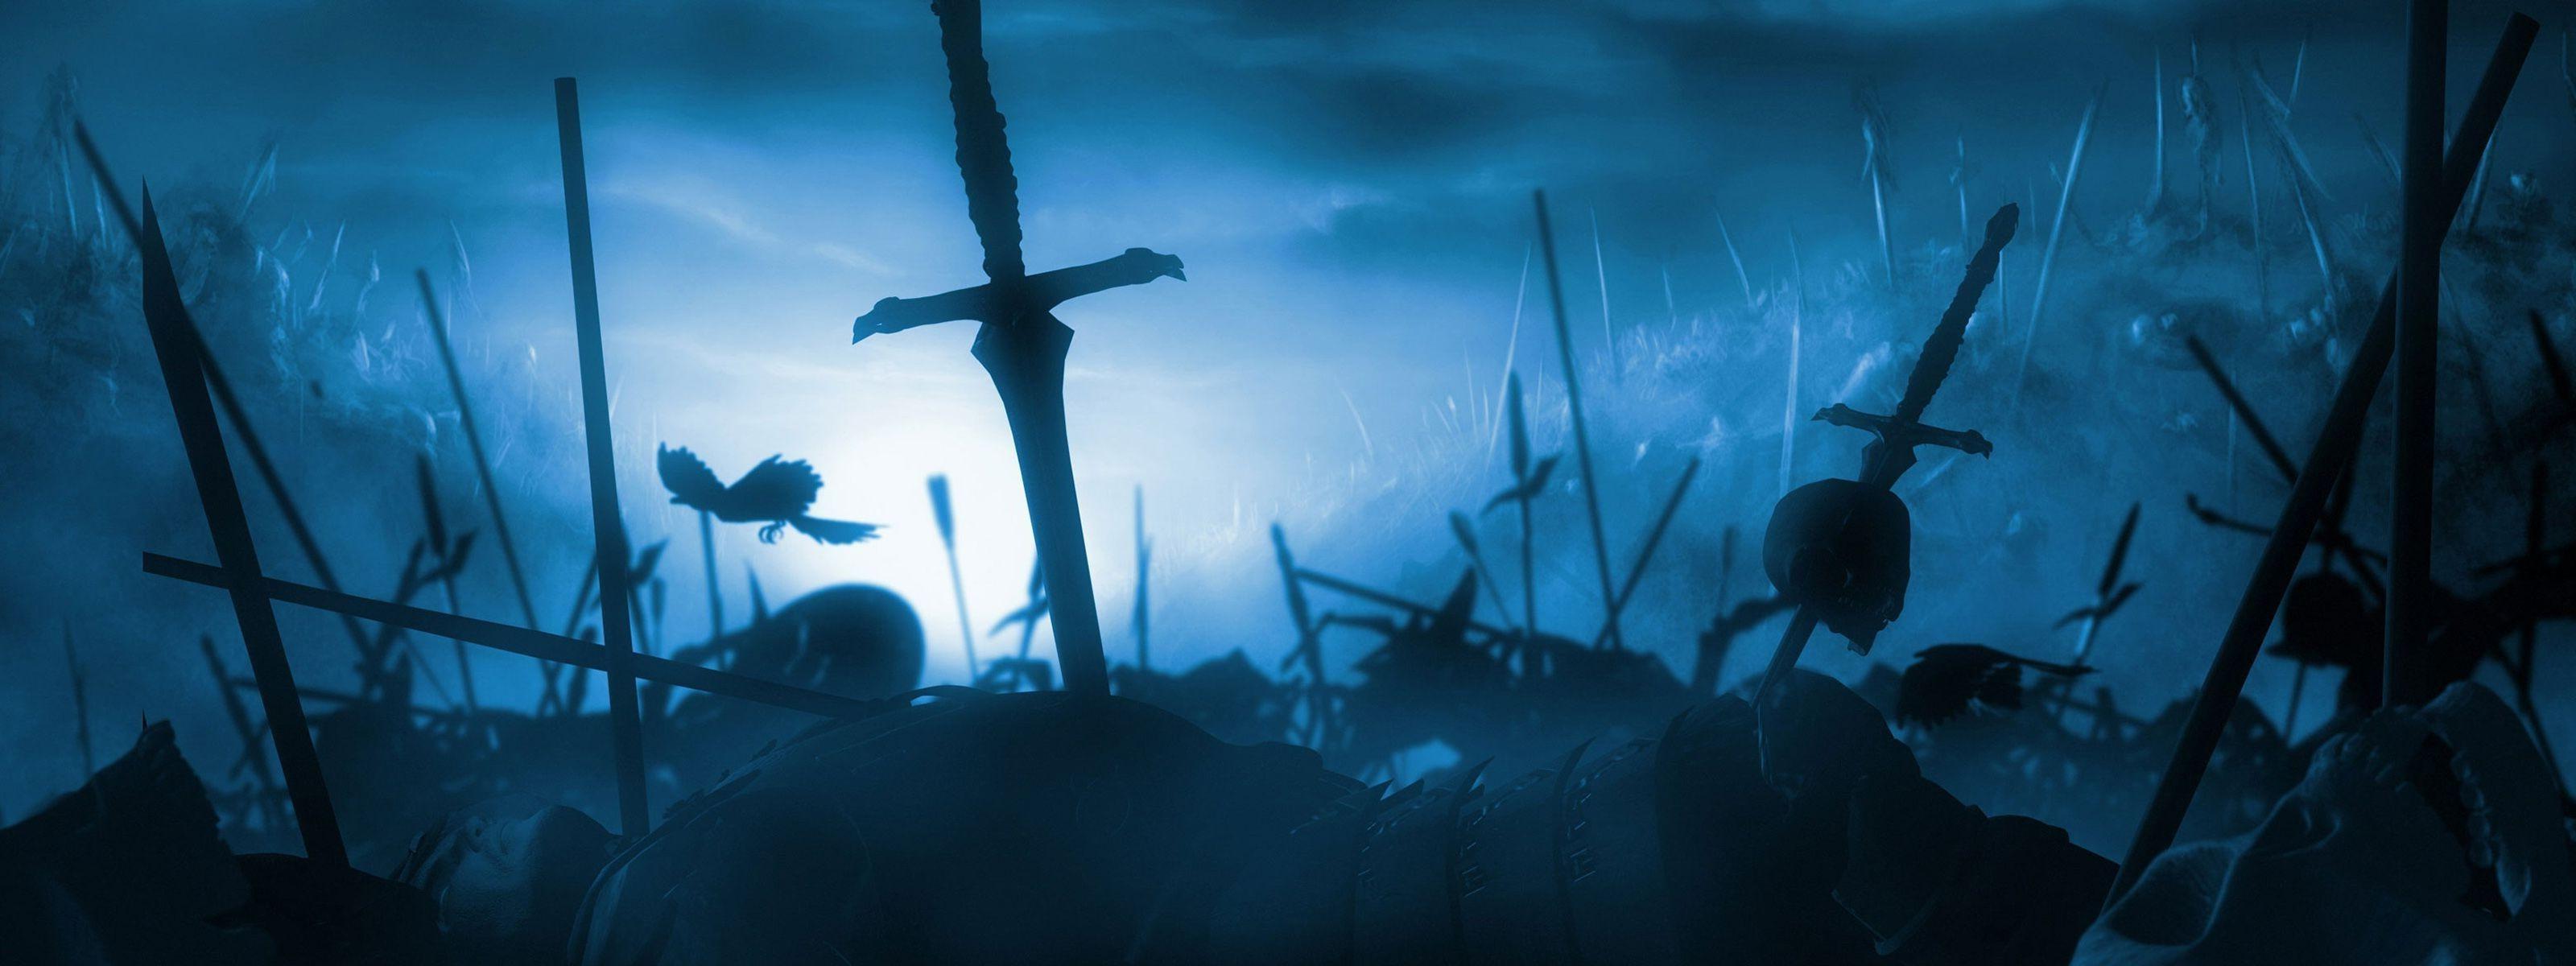 3d Sword Games Hd Wallpaper For Mobile: Blue Sword Wallpaper (68+ Images